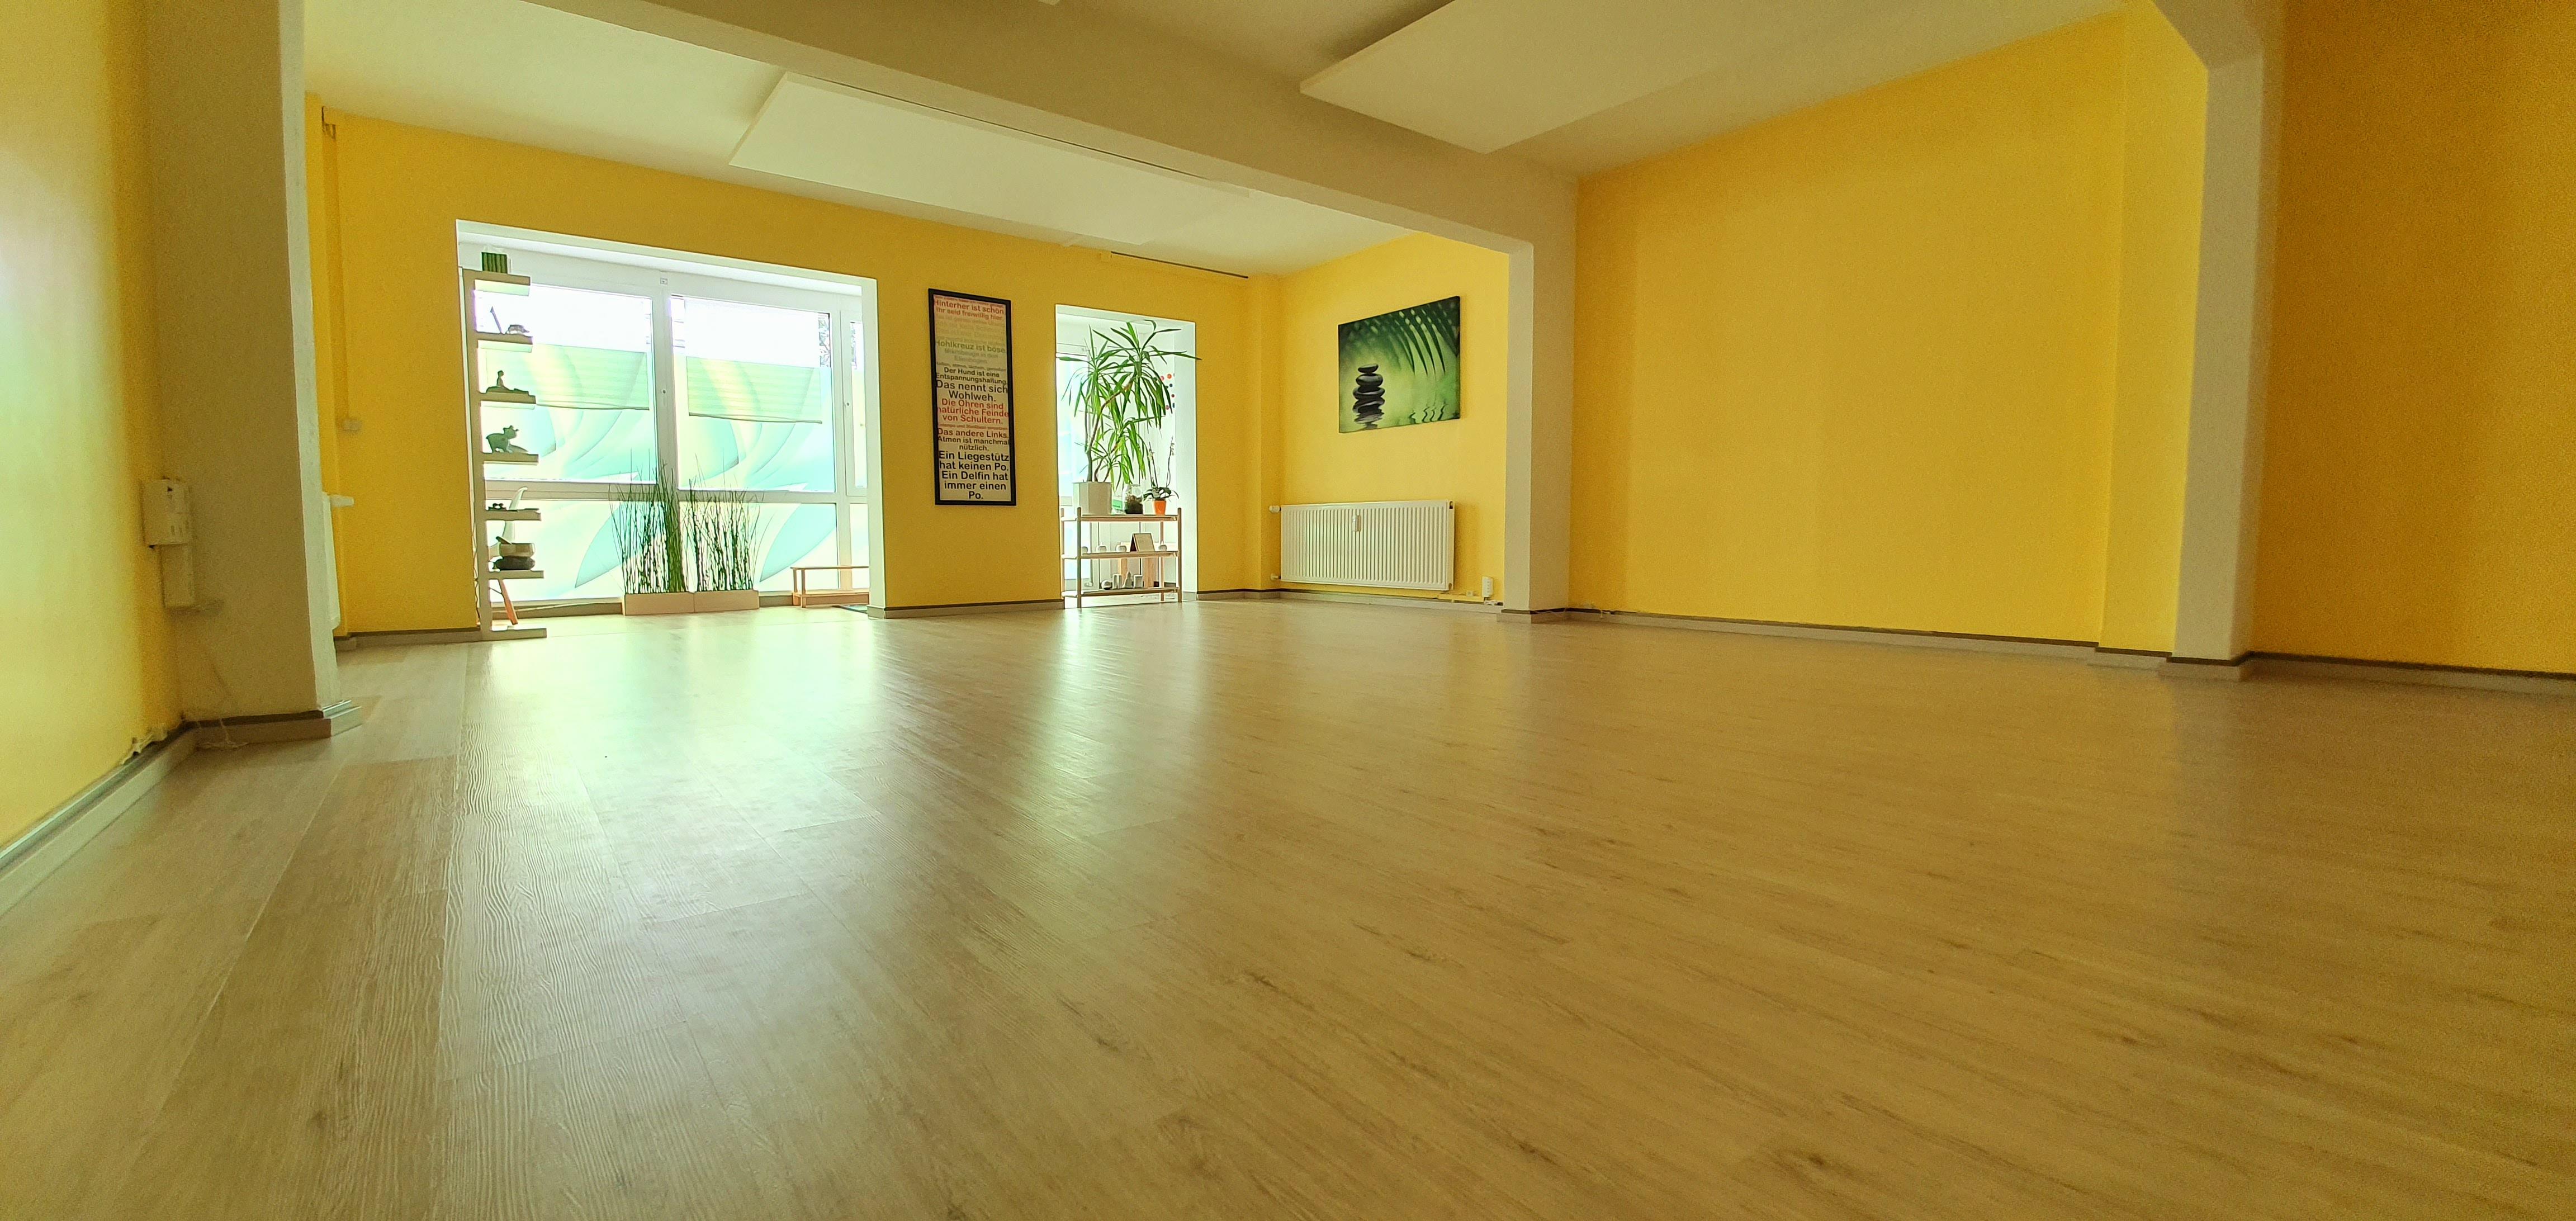 Yoga Hellersdorf Studio am Teterower Ring 35